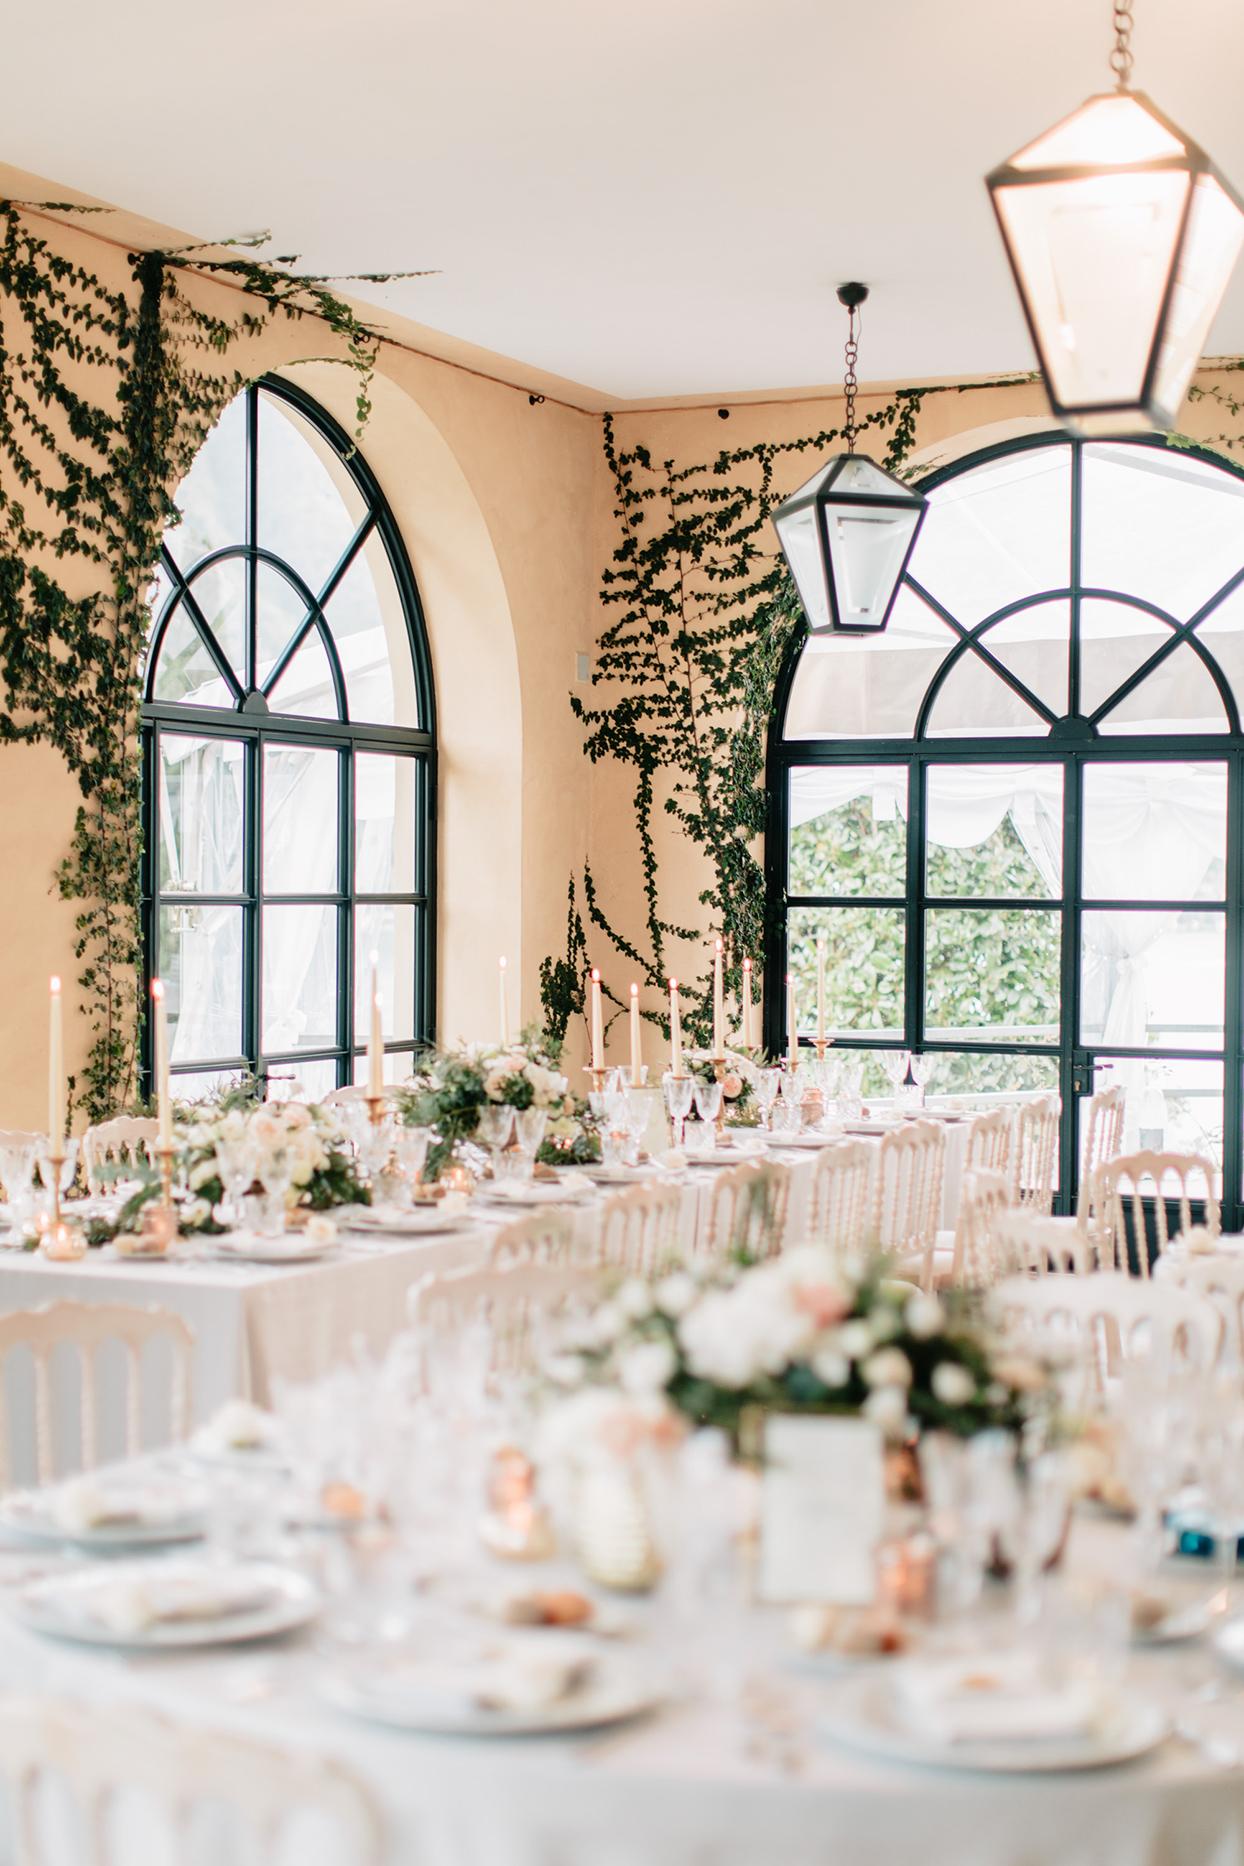 kiira arthur wedding reception tables inside venue